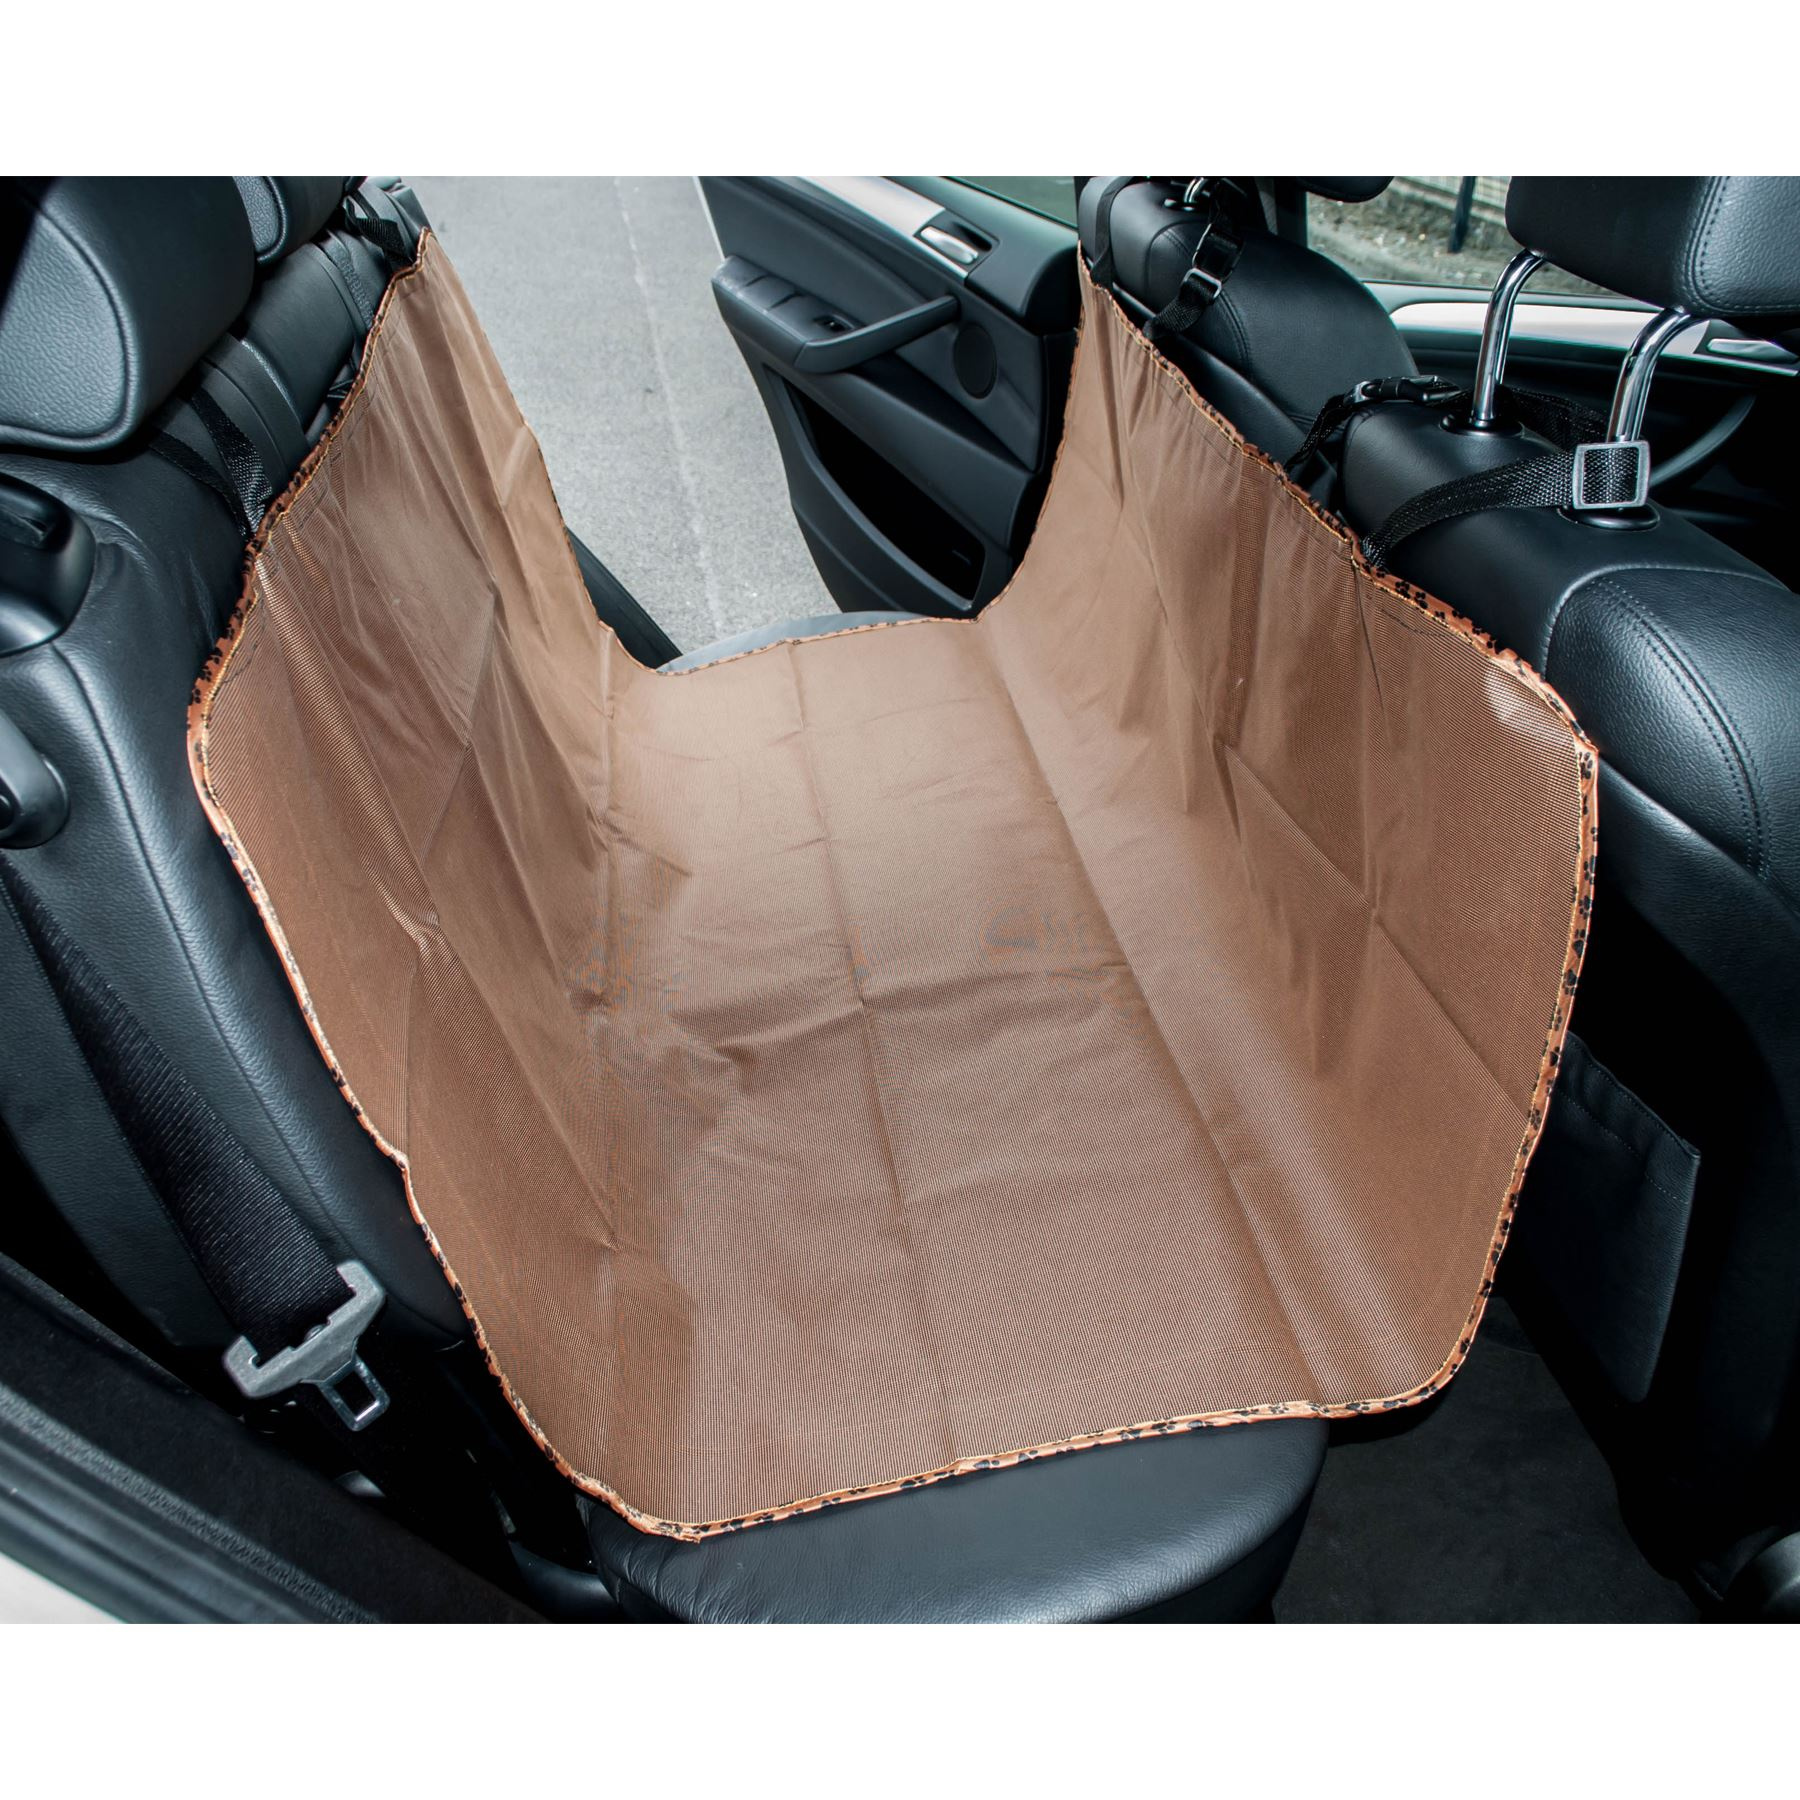 muddy pups pet seat boot car cover protection 142 x 123cm waterproof microfibre ebay. Black Bedroom Furniture Sets. Home Design Ideas